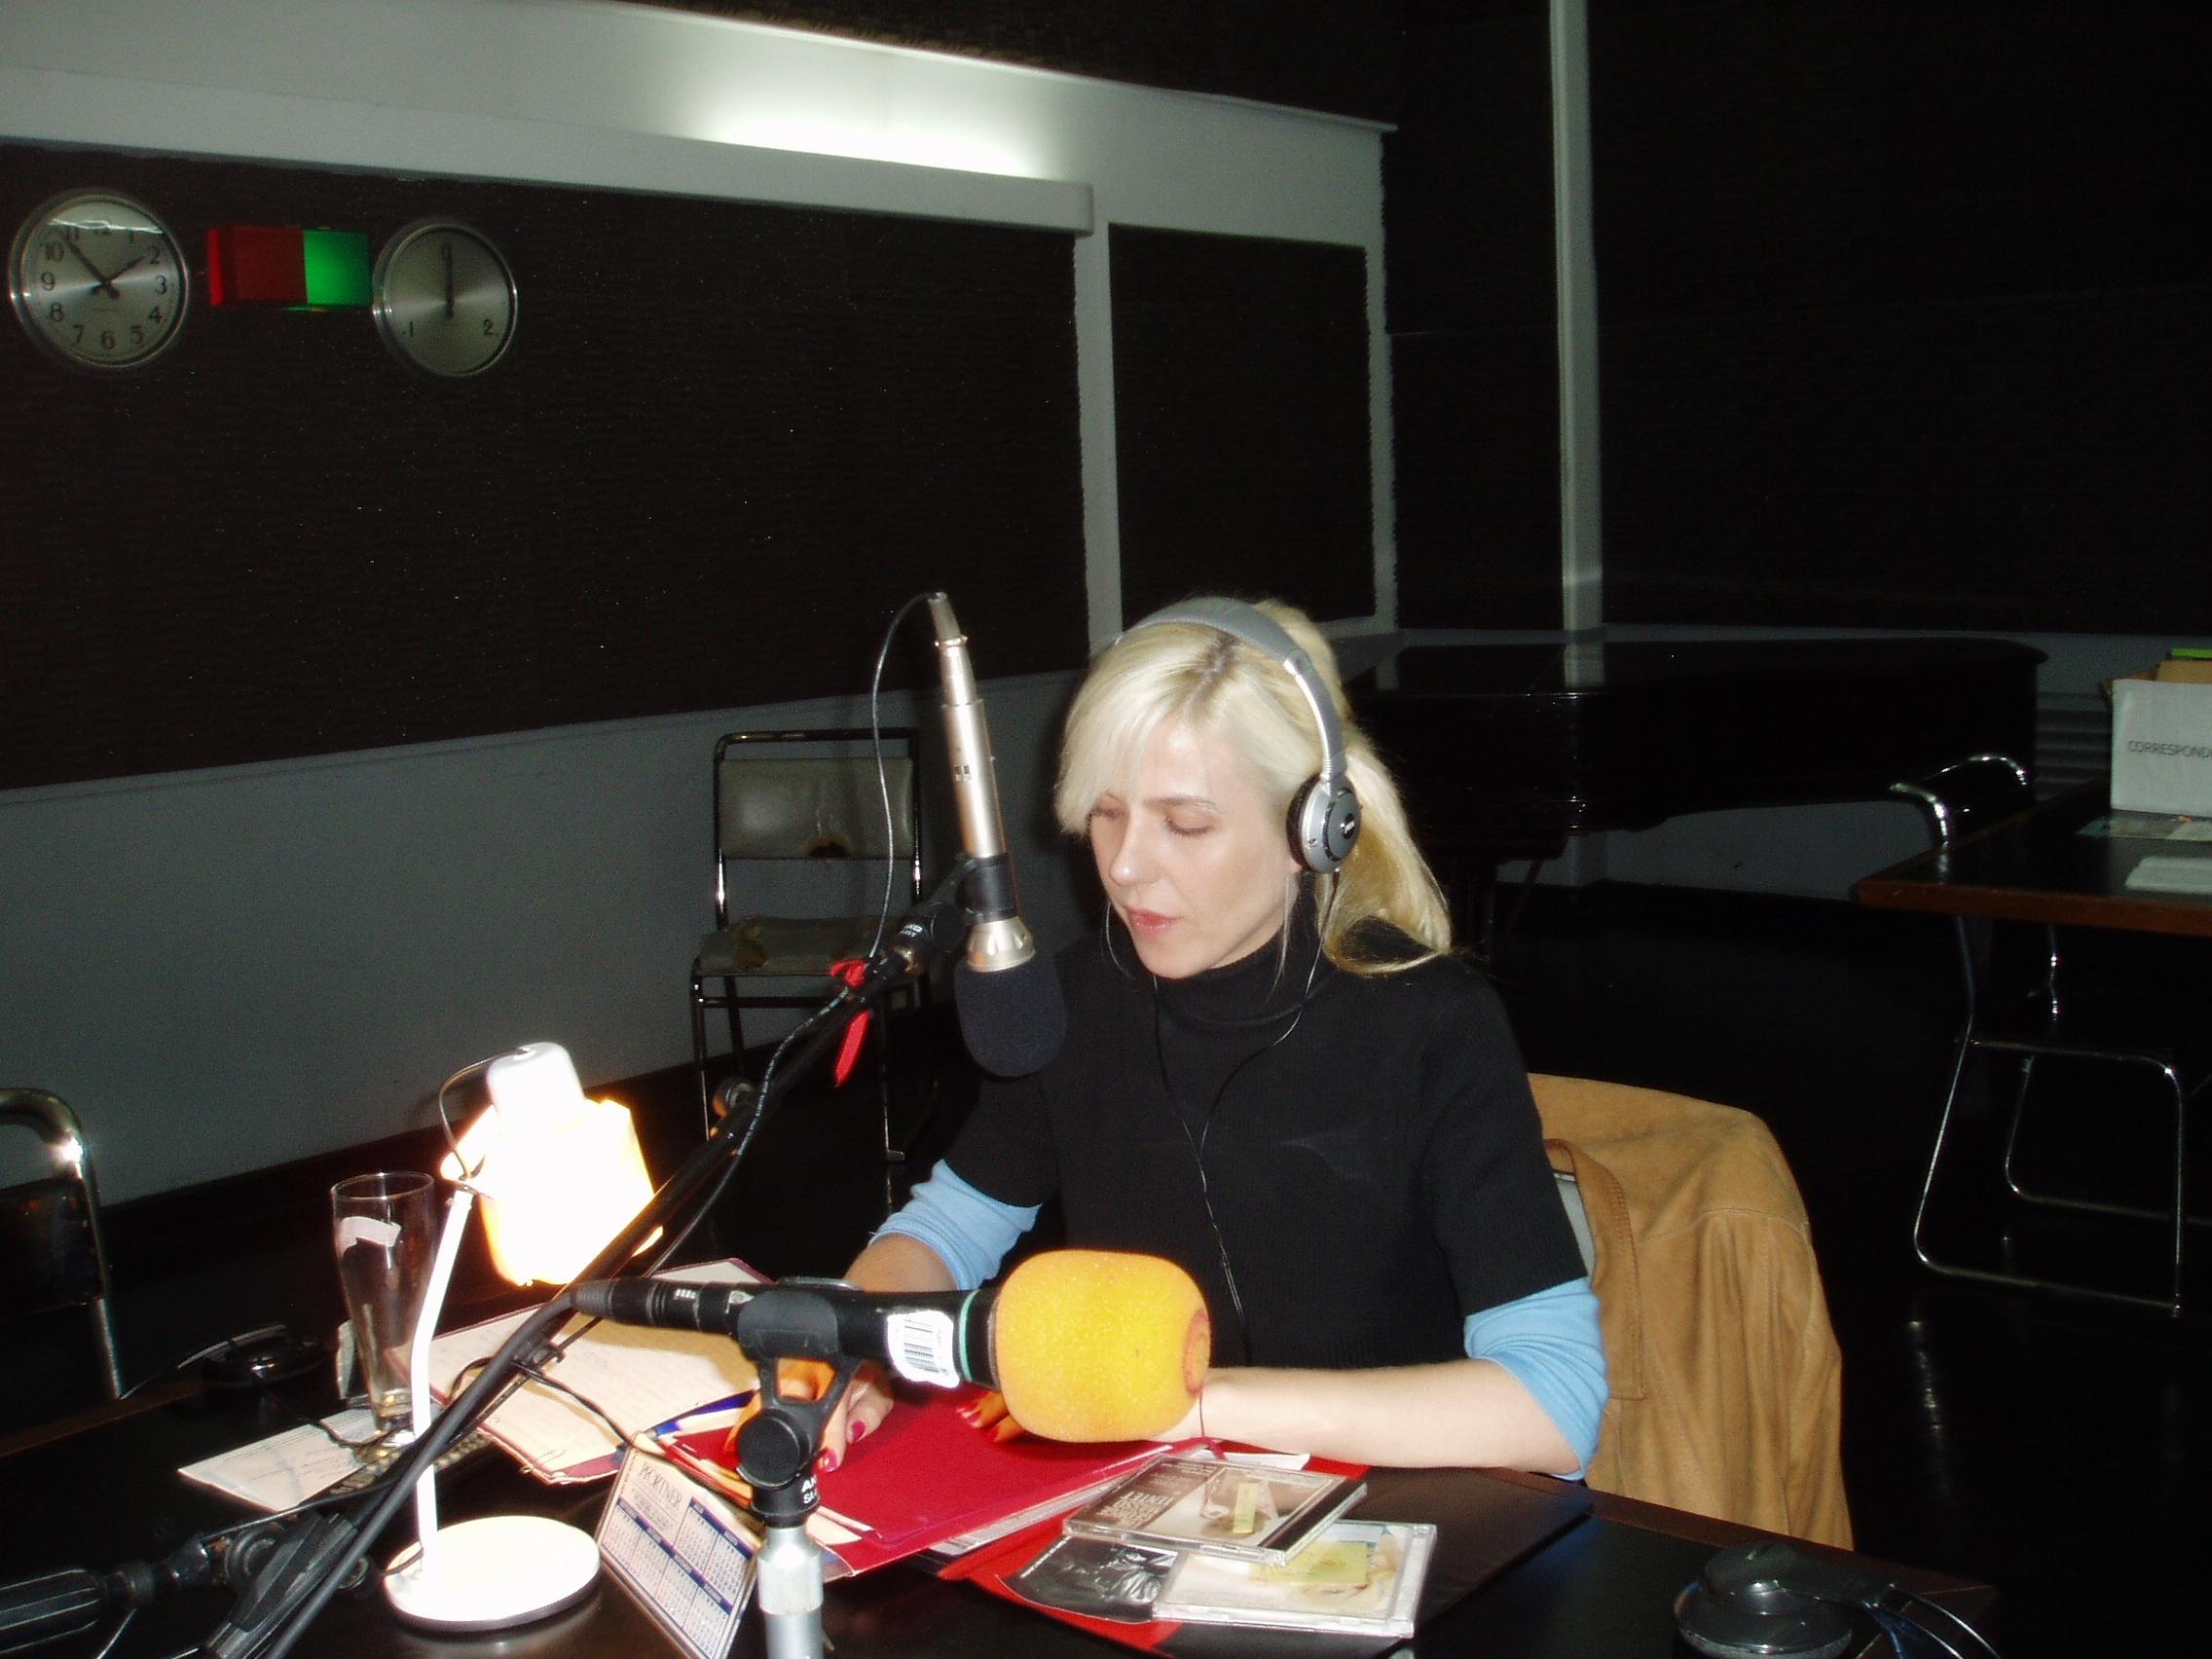 Interviewed at NPR Argentina, 2006